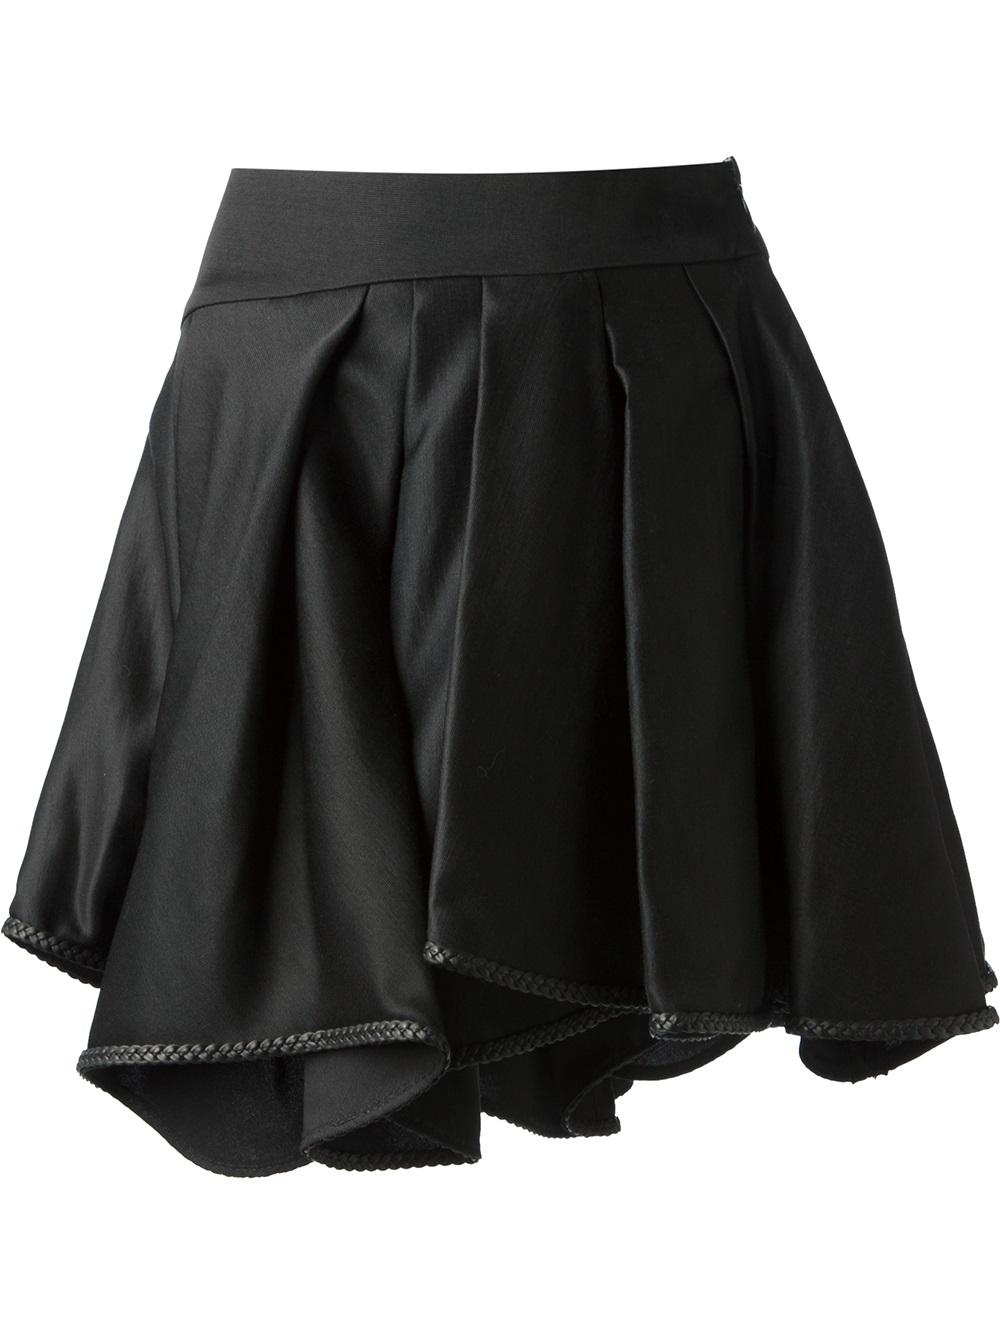 ahr pleated mini skirt in black lyst